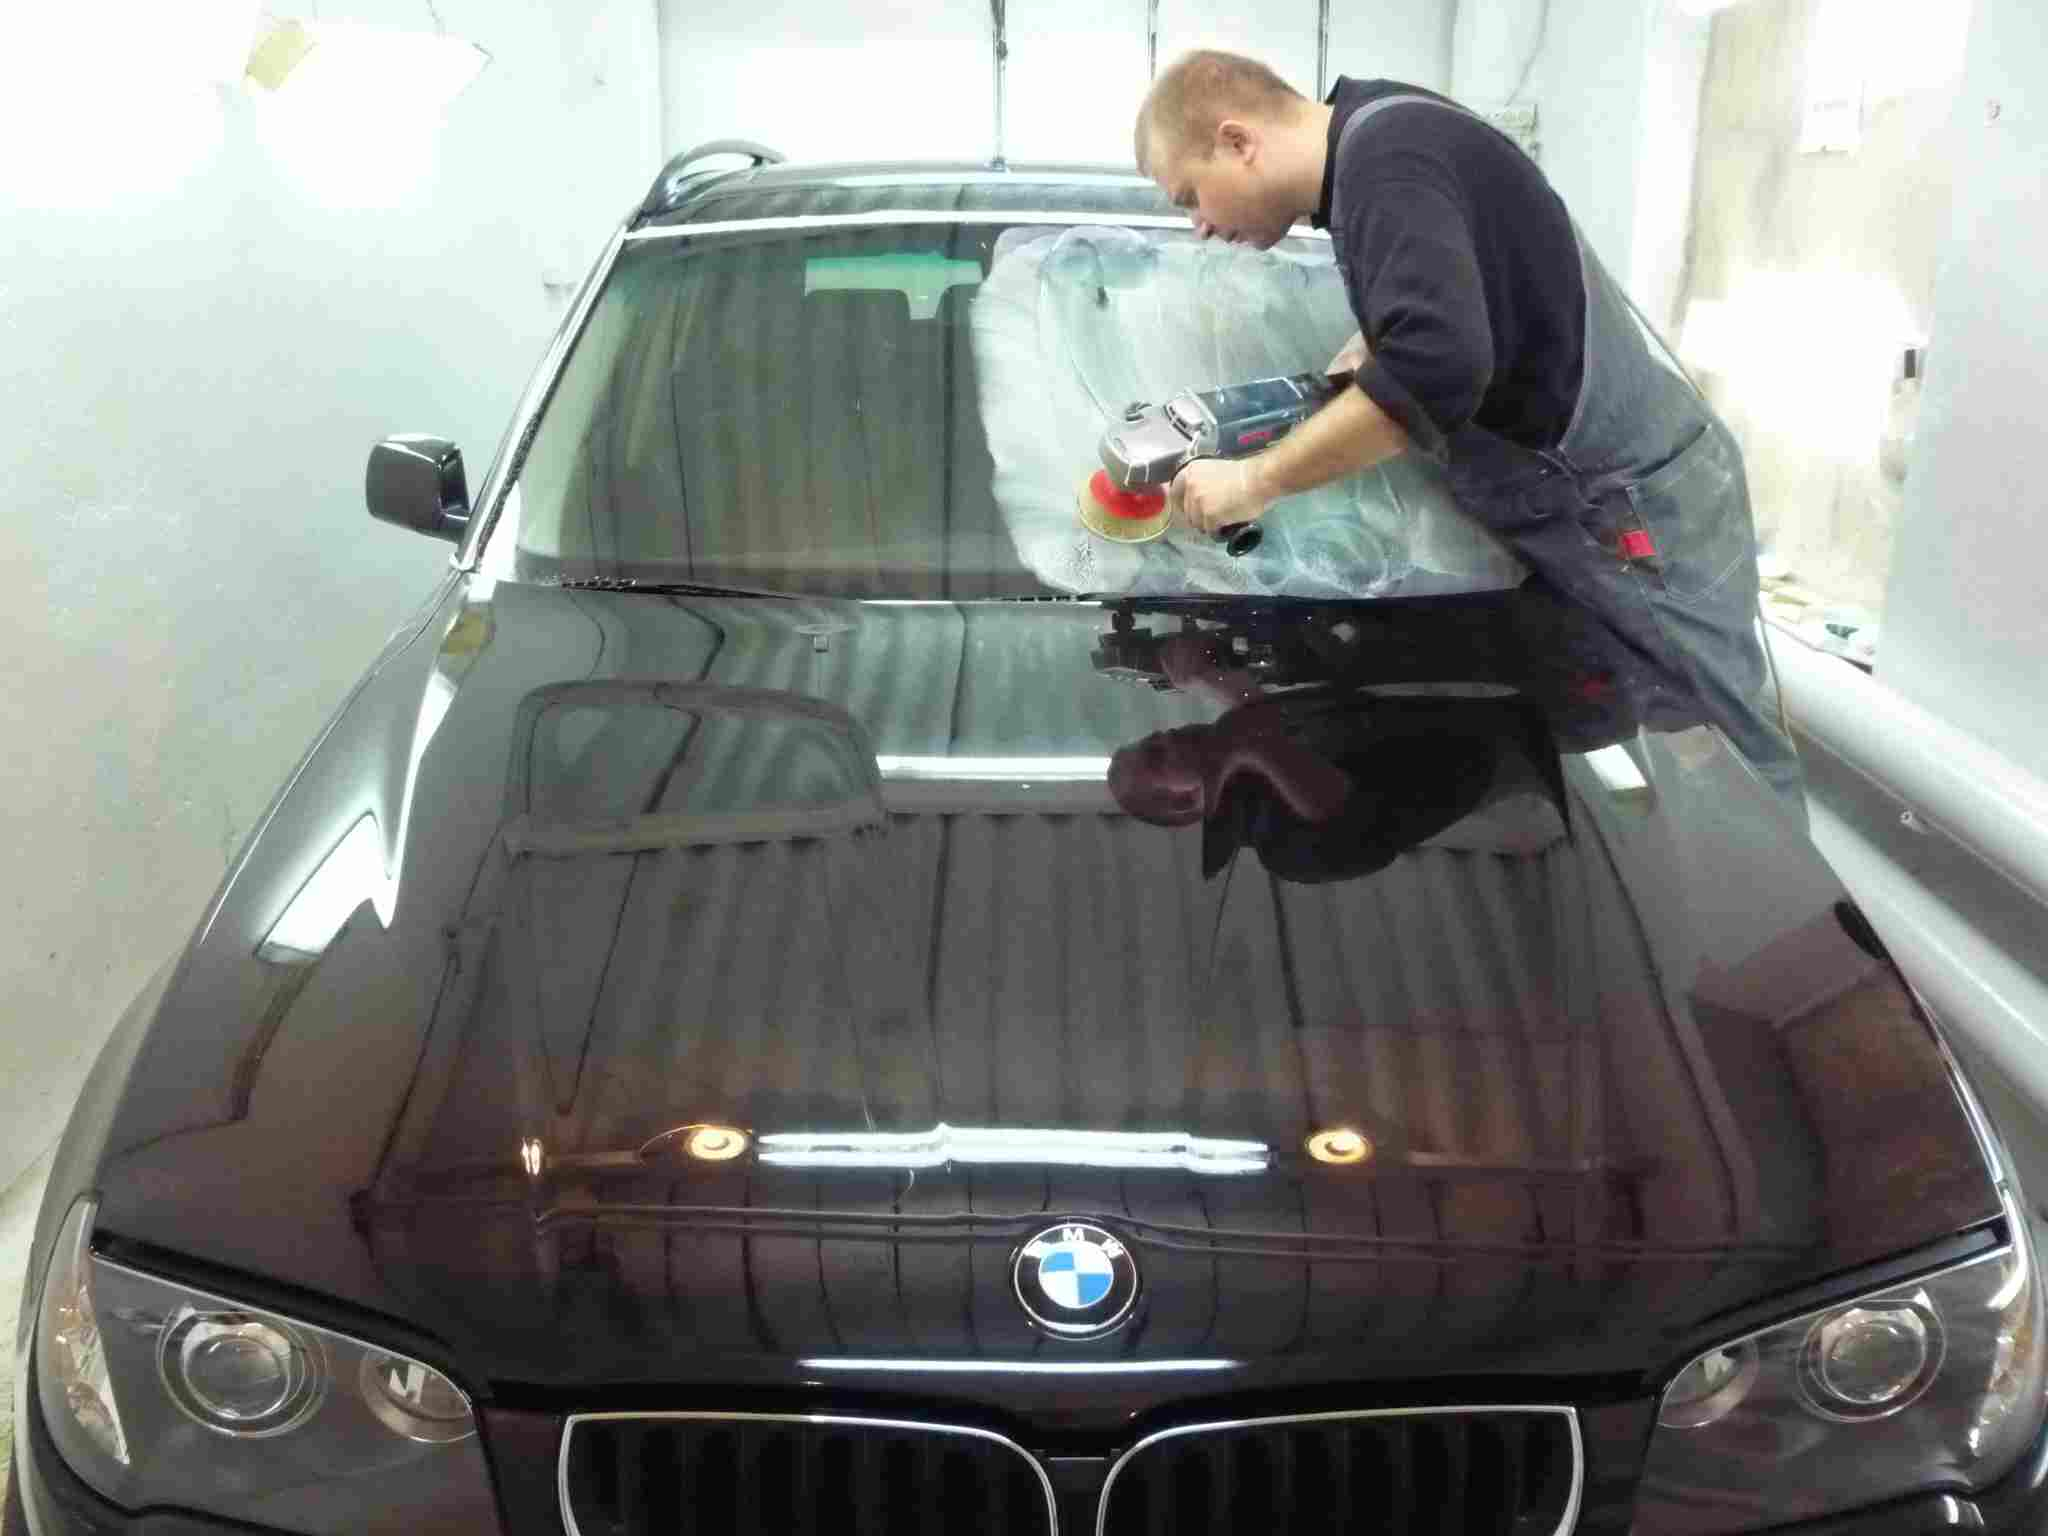 Полировка царапин стекла автомобиля от царапин своими руками